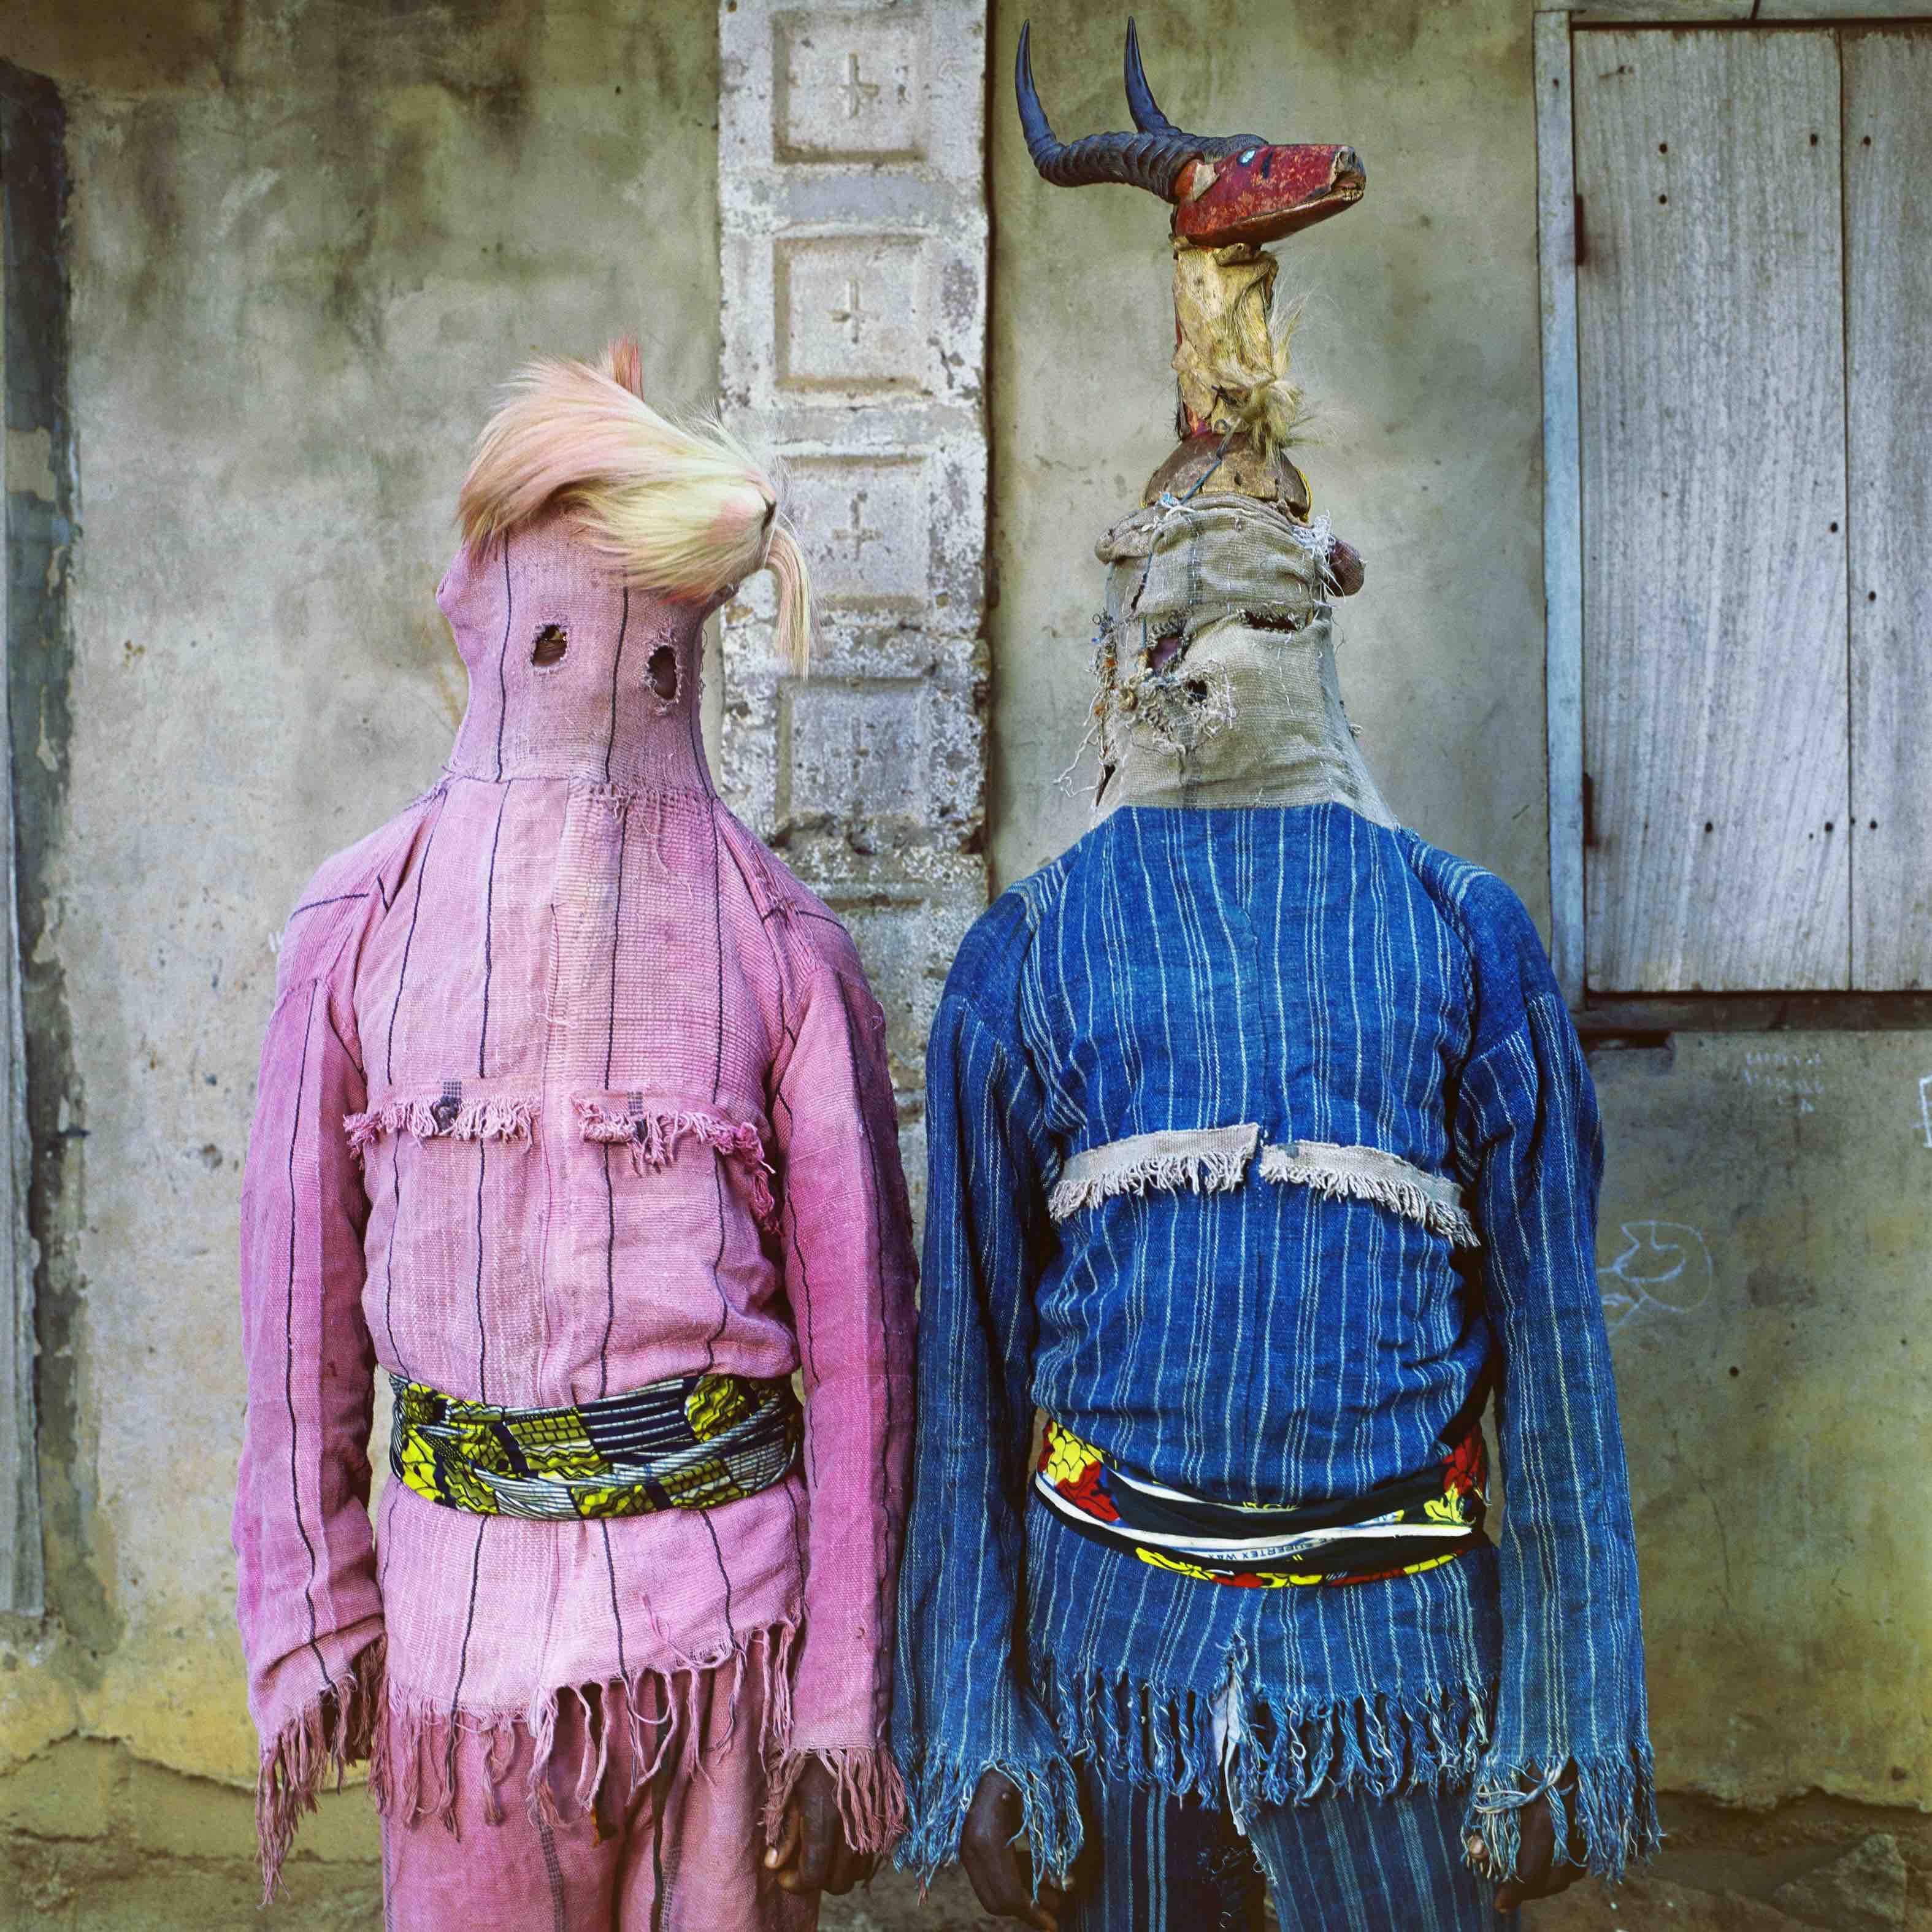 Akata Masquerade. Nigeria. 2004 © Phyllis Galembo courtesy Aperture